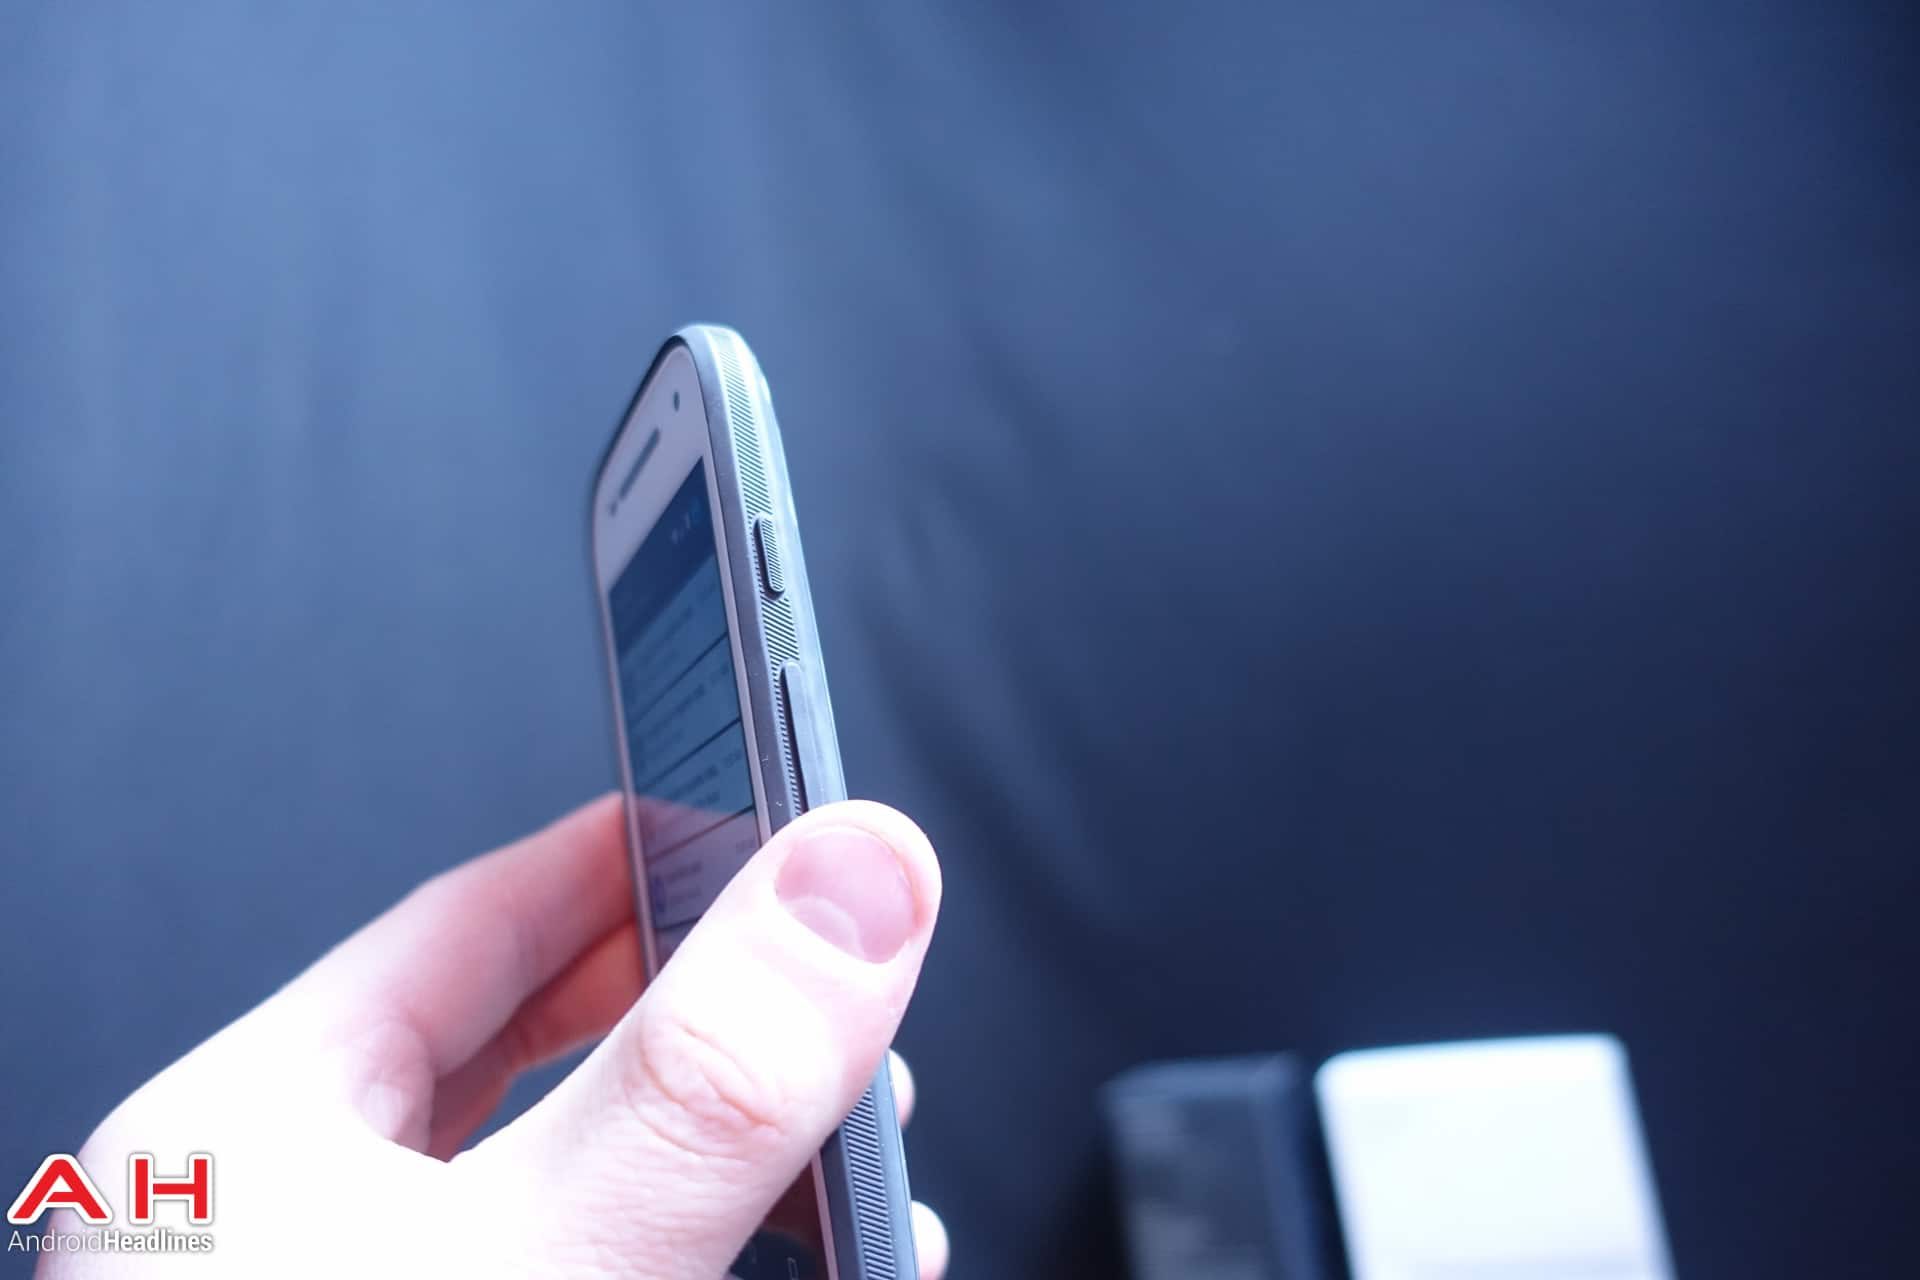 Moto E 4G LTE AH 03980